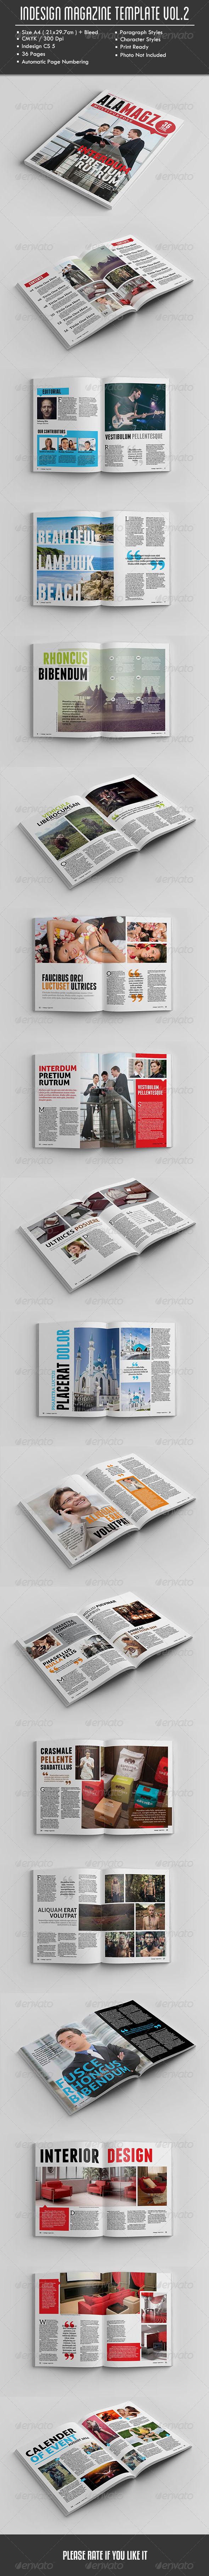 GraphicRiver InDesign Magazine Template Vol.2 8569305